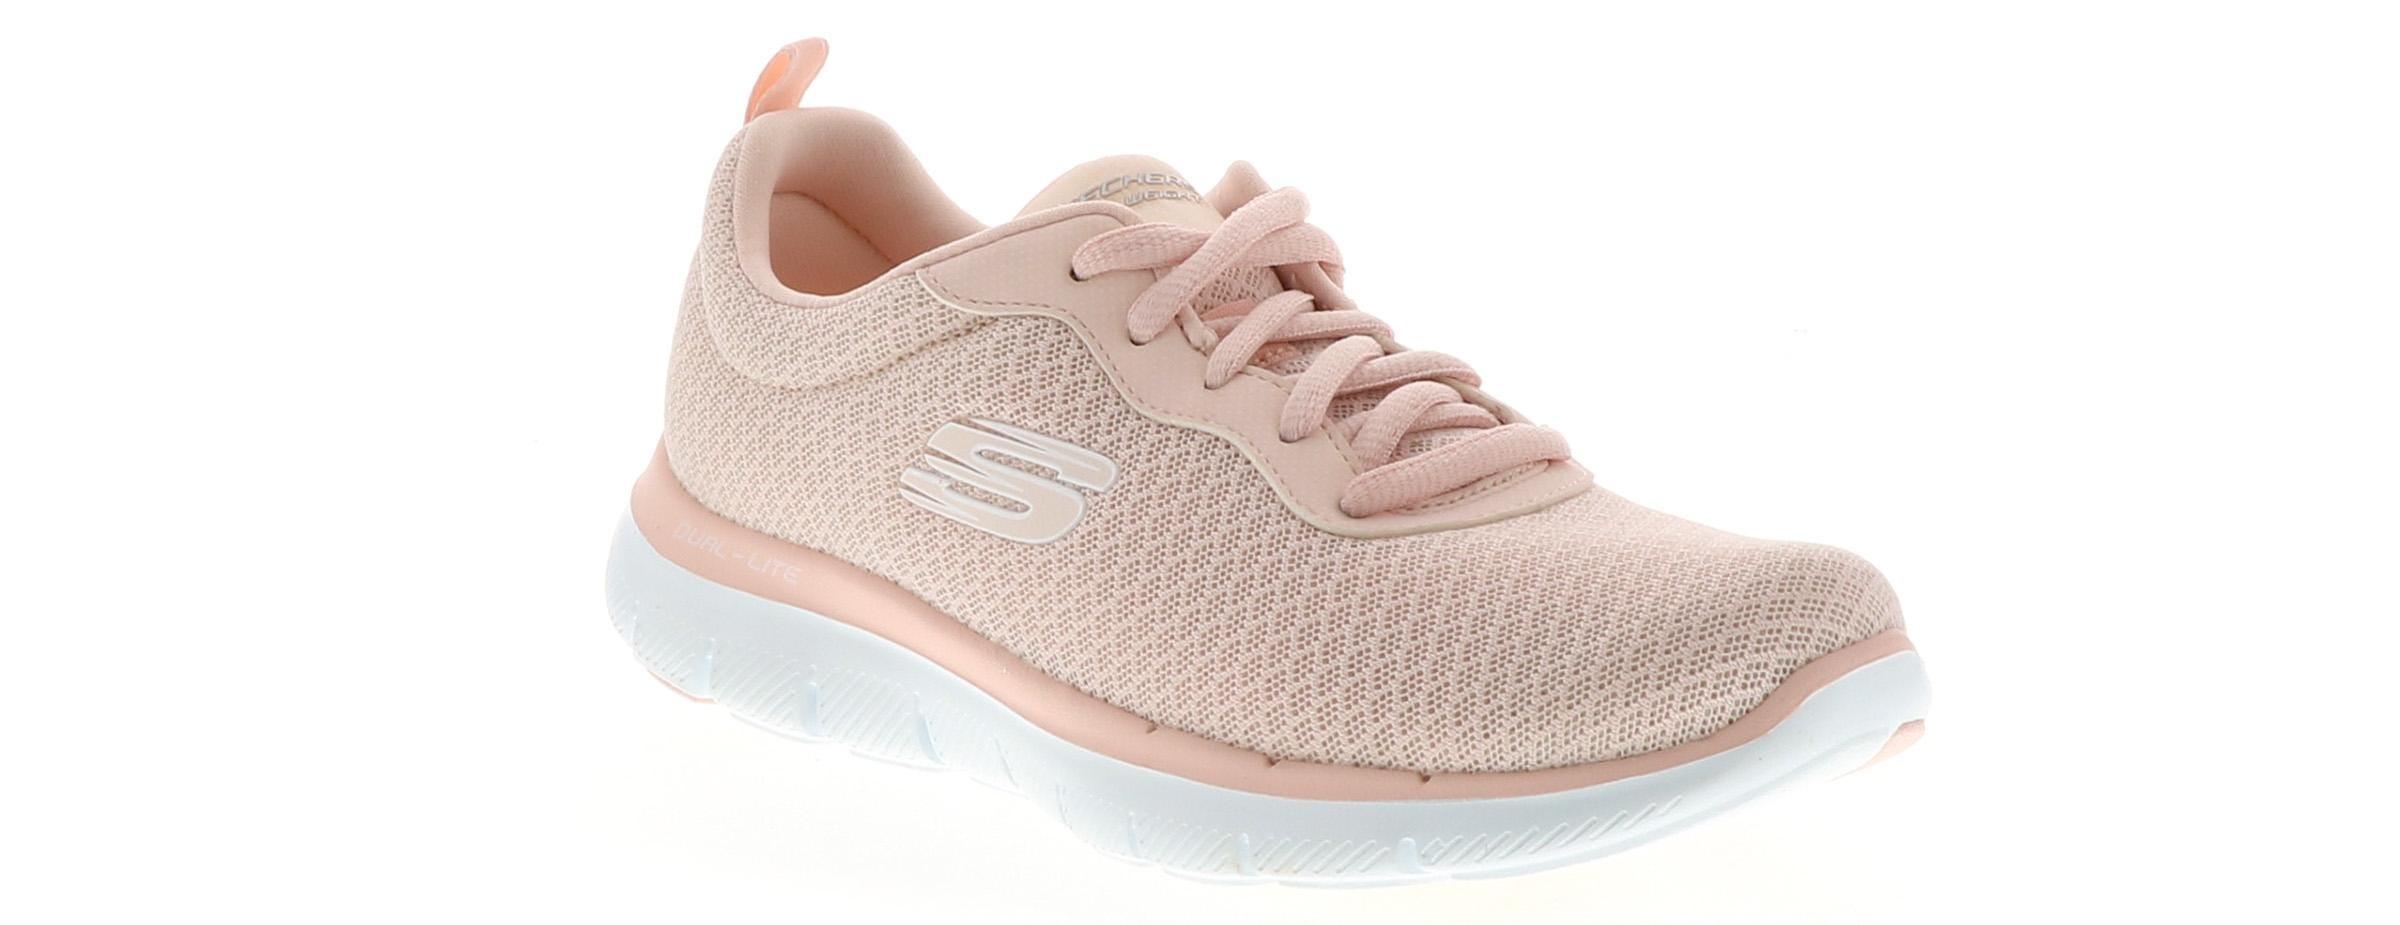 0 Flex Pink Women's Skechers 2 Appeal Newsmaker xCoBde